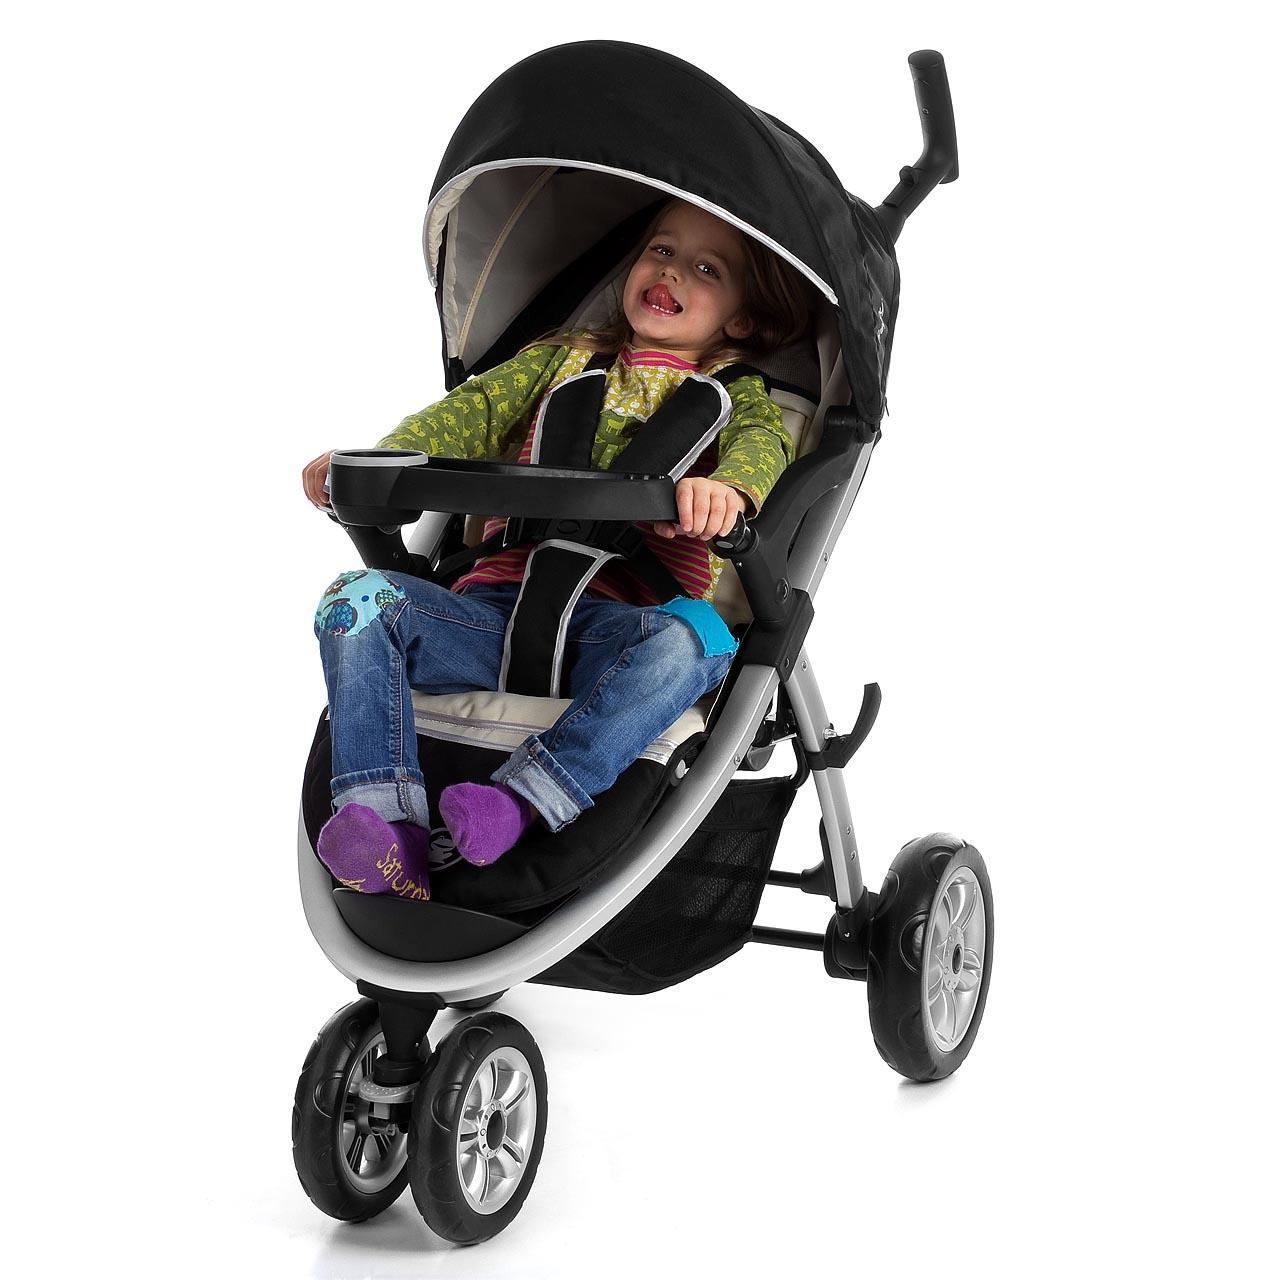 Froggy 174 Citybug Safari Pram Child Stroller Pushchair Buggy